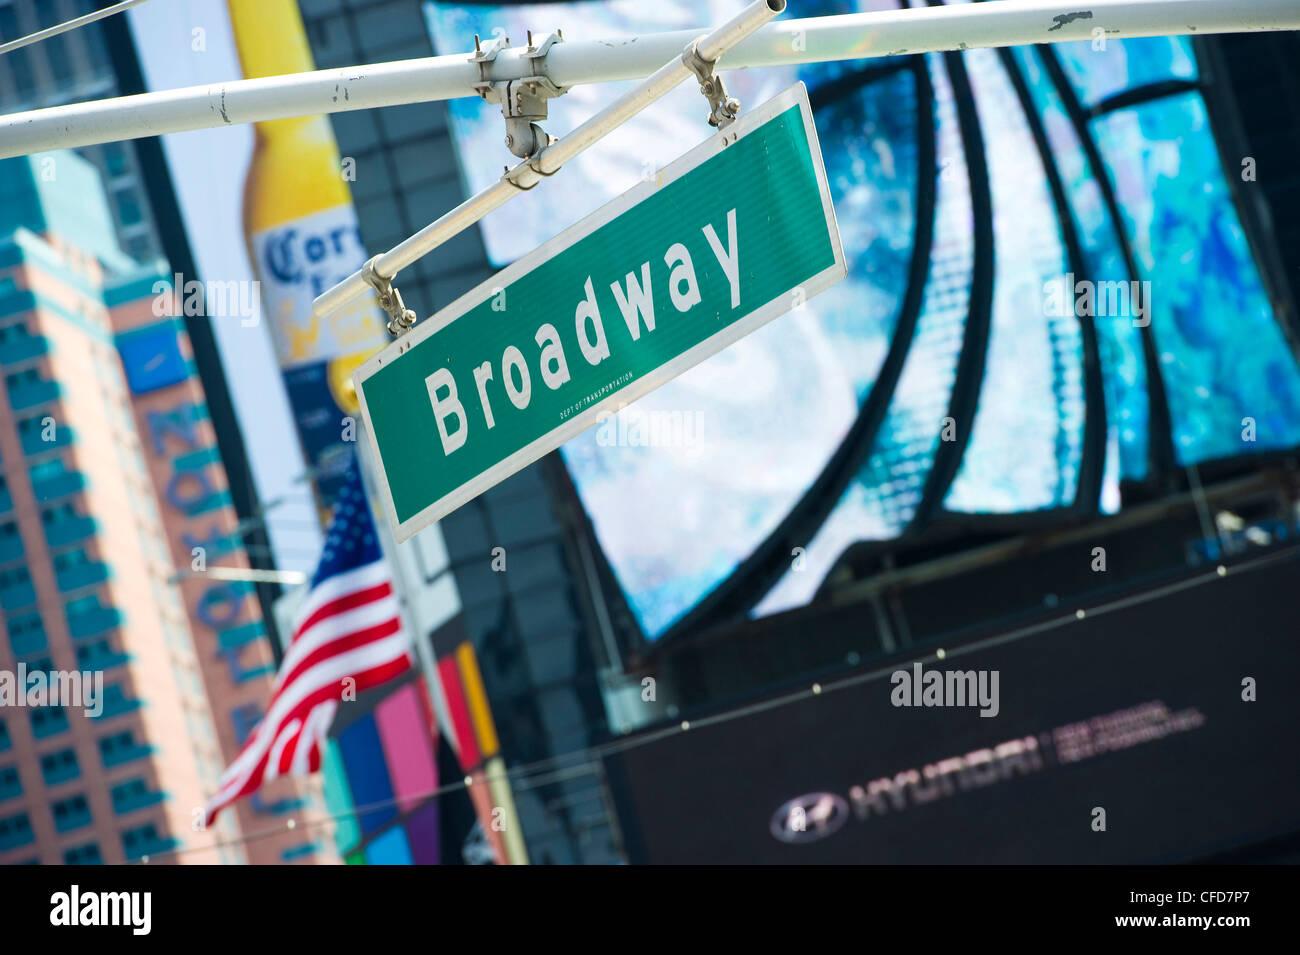 Broadway streetsign at Times Square, Manhattan, New York, USA - Stock Image